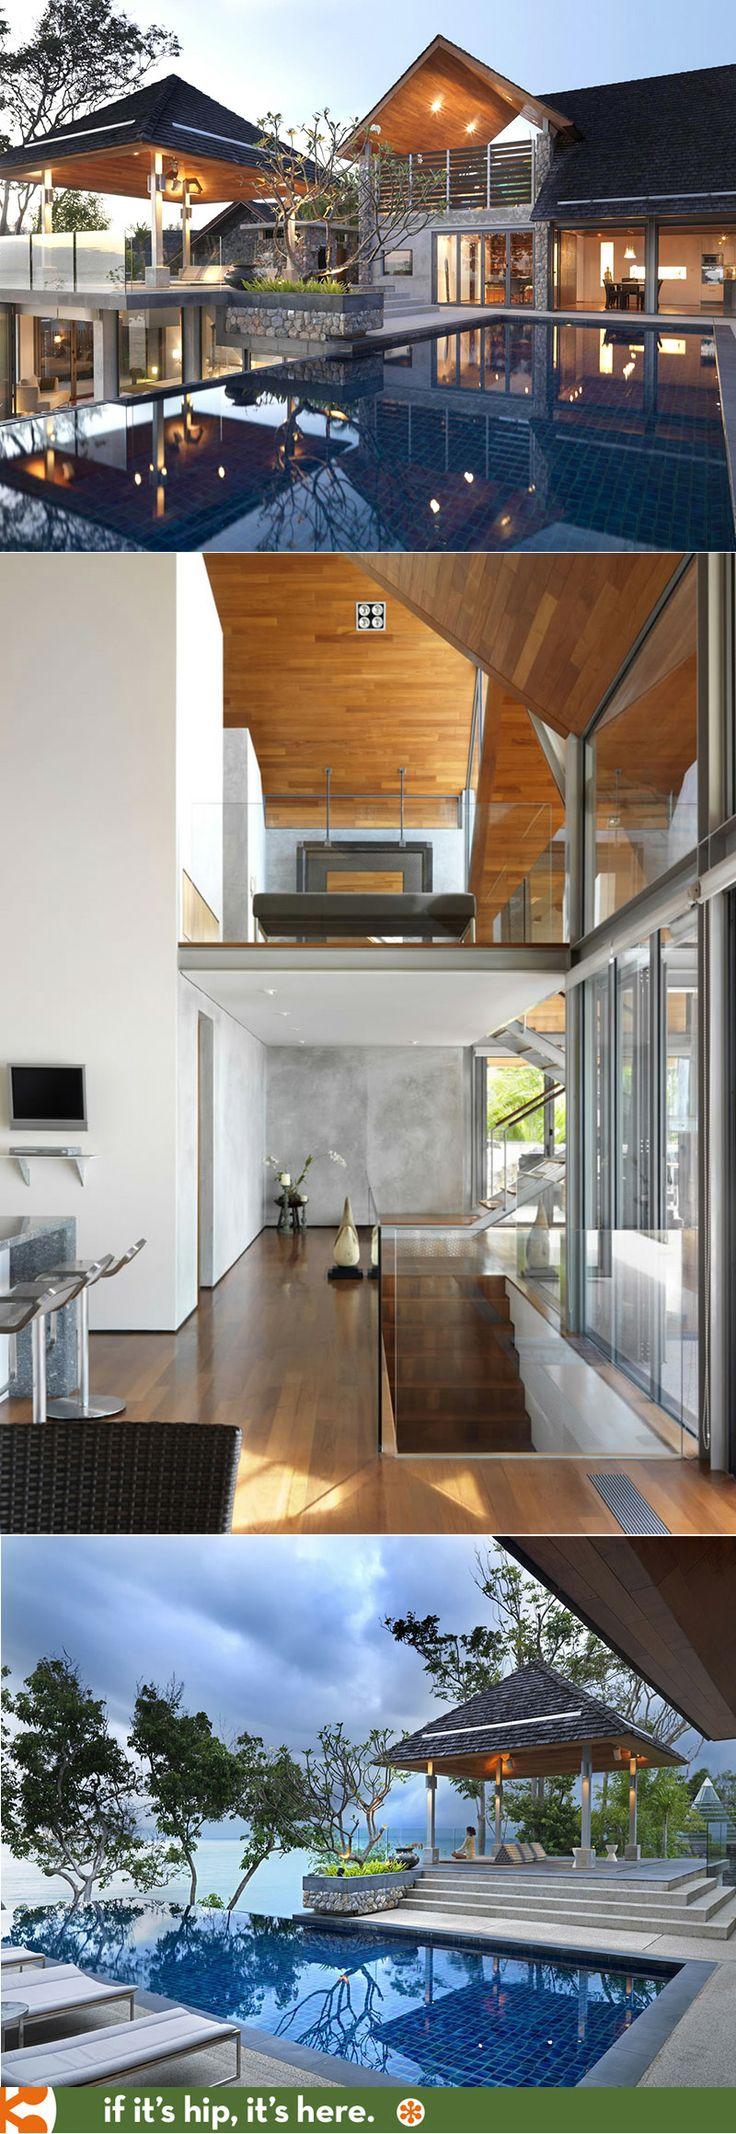 House design thailand - Stunning Private Villa Mixes Modern And Traditional Thai Design Architecture Phuket